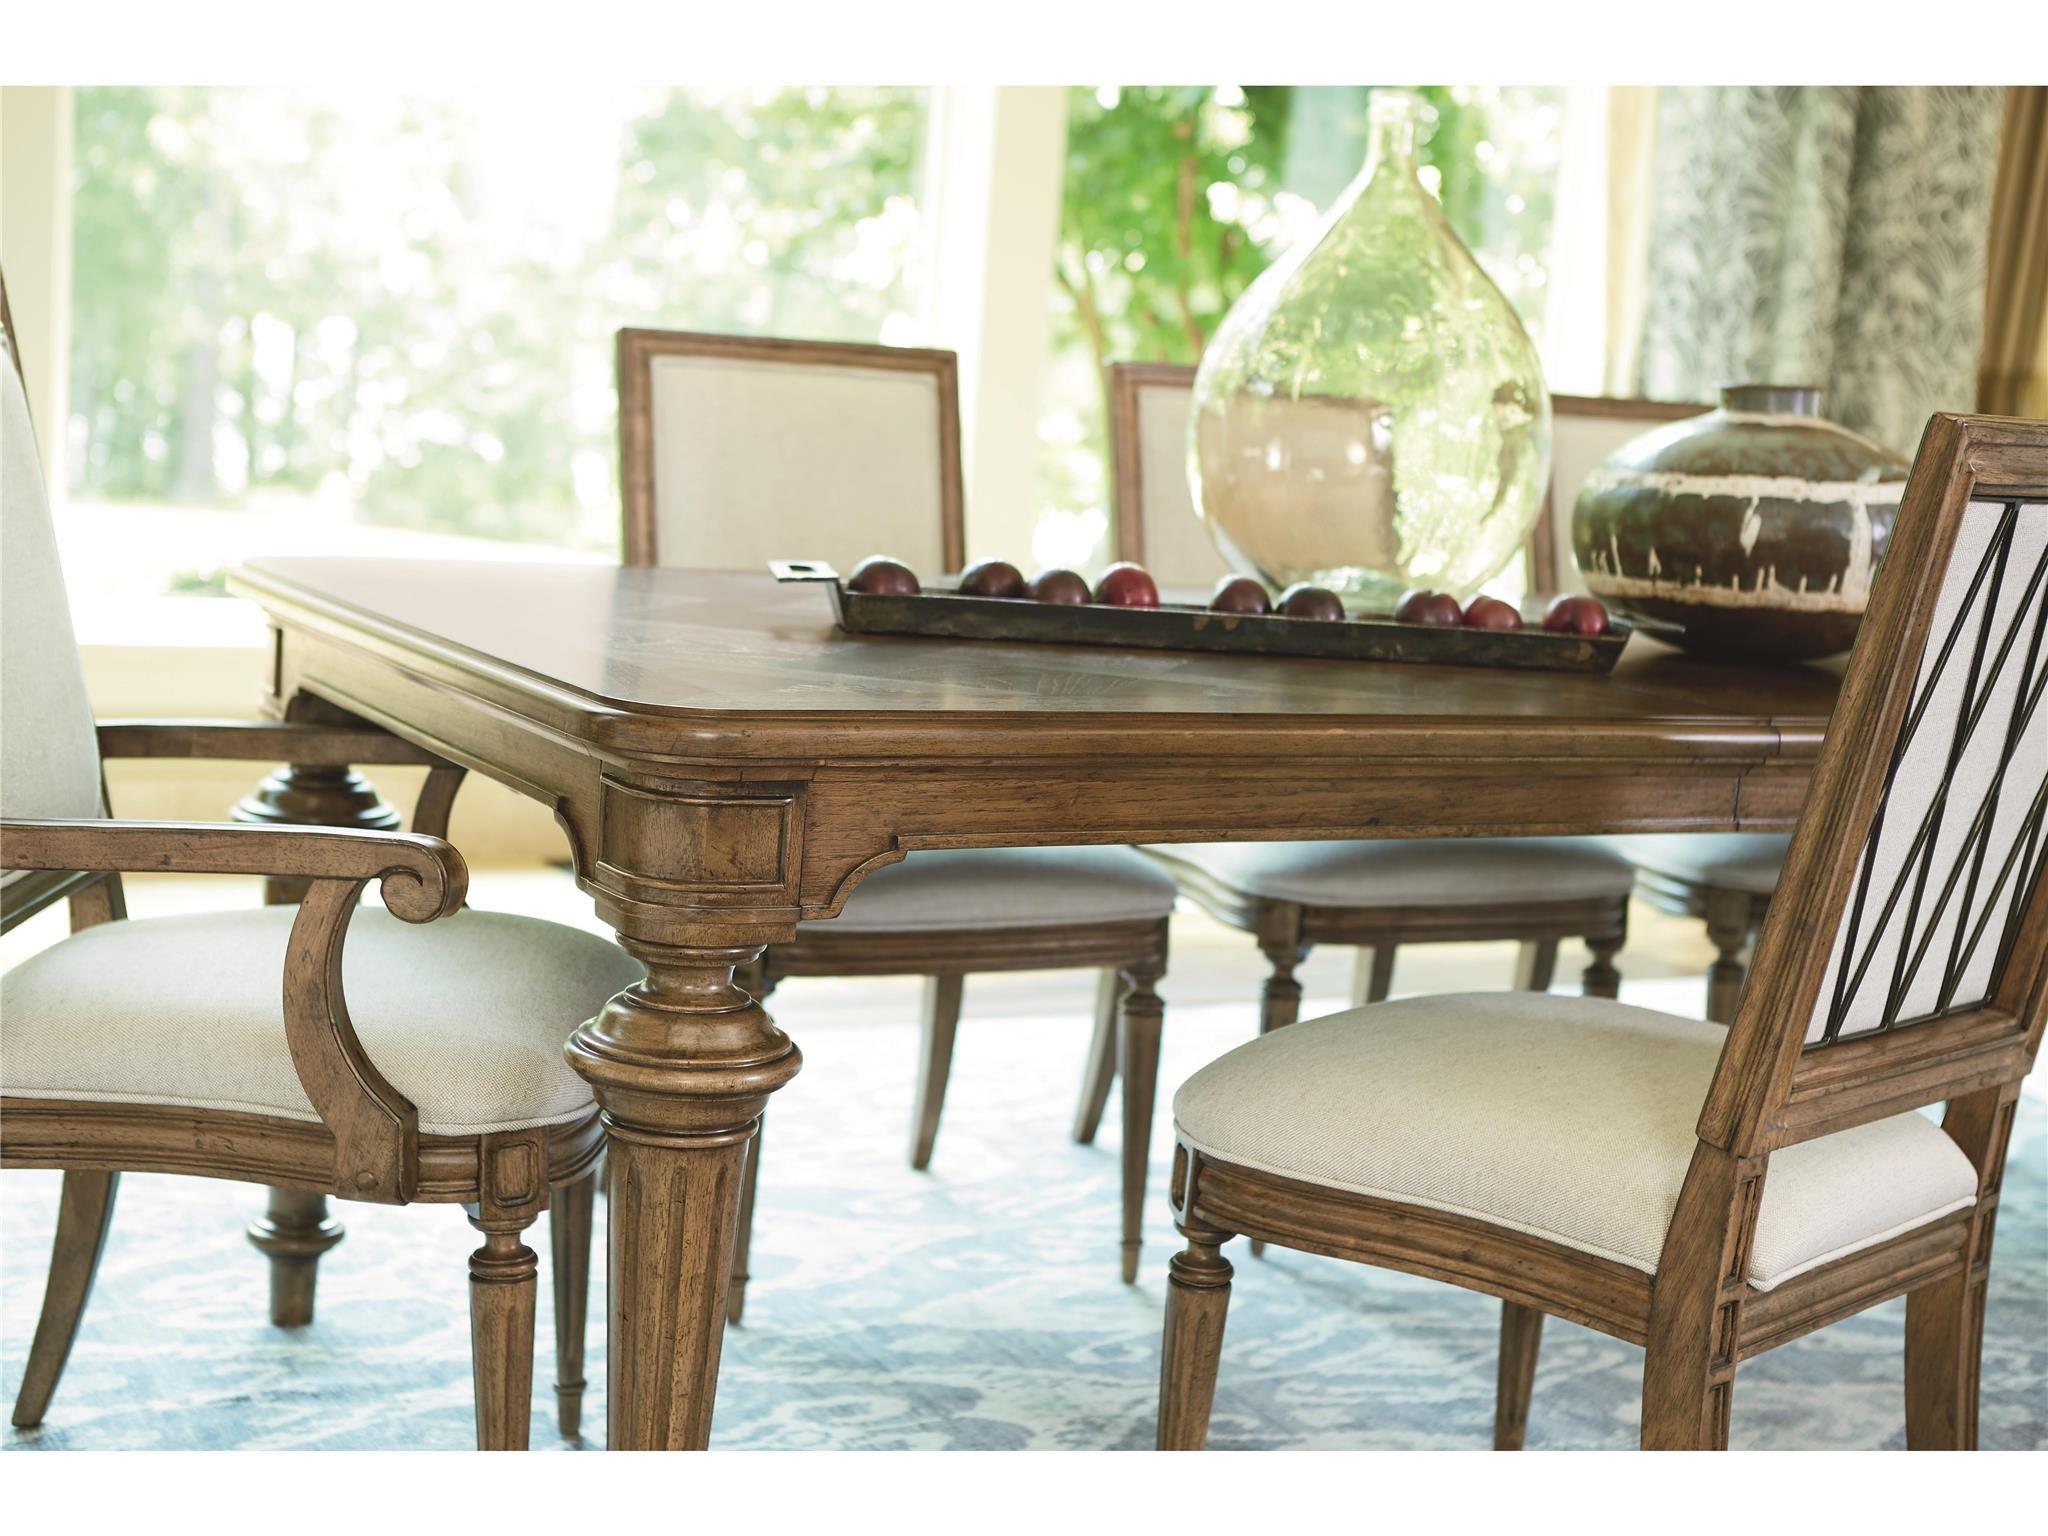 Universal Furniture Remix Remix Dining Table Stol Stul